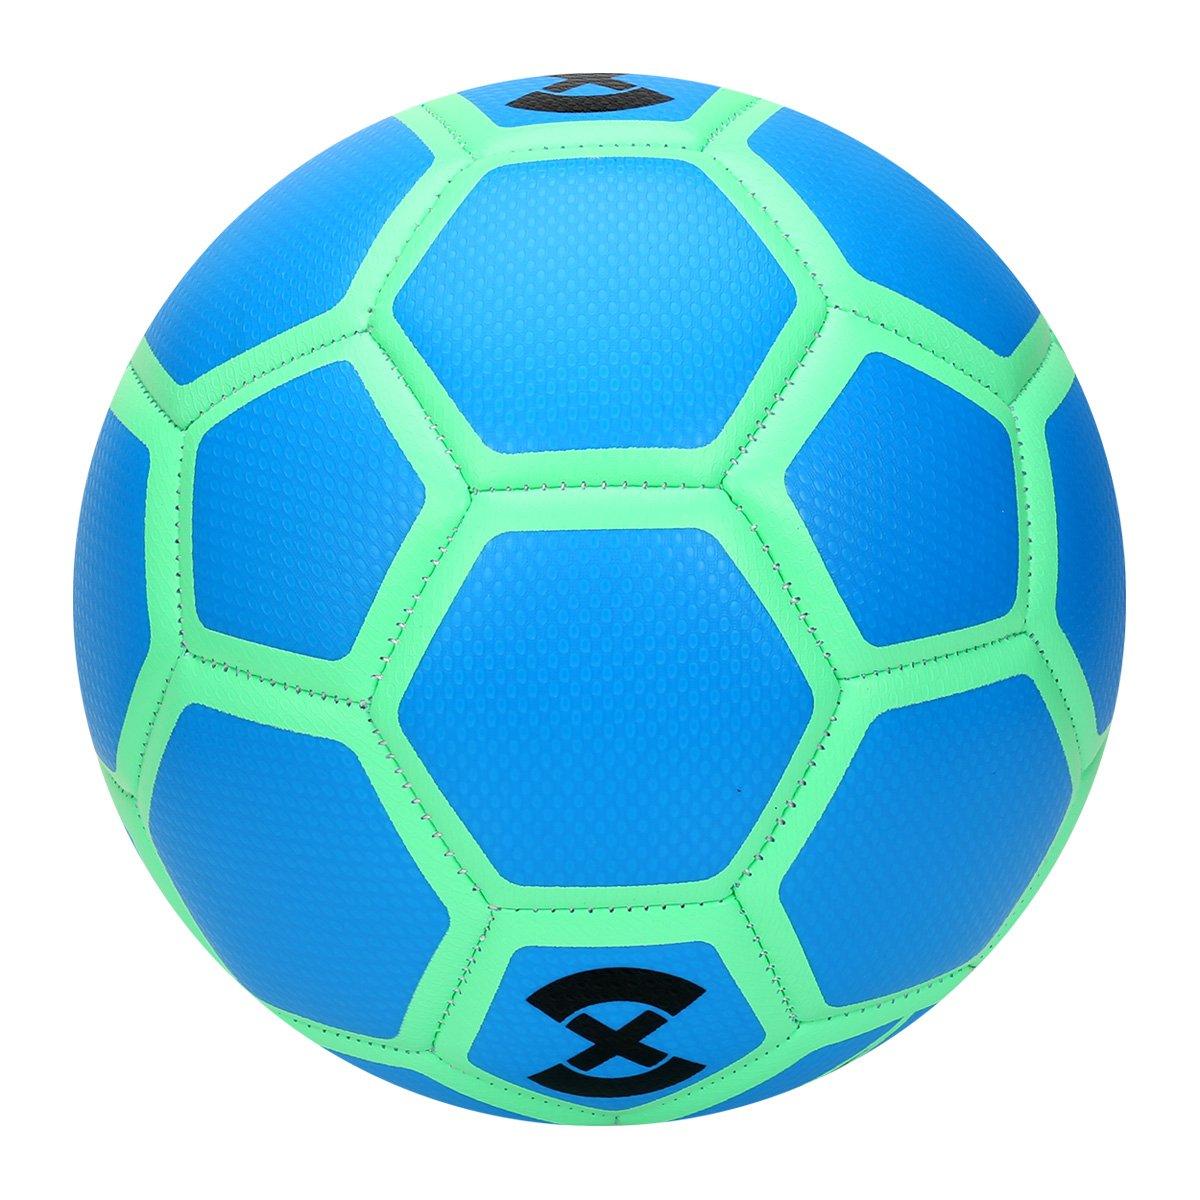 5ce70b4a73 ... Bola Futsal Nike FootballX Menor. Bola Futsal Nike FootballX Menor - Azul  Piscina+Verde